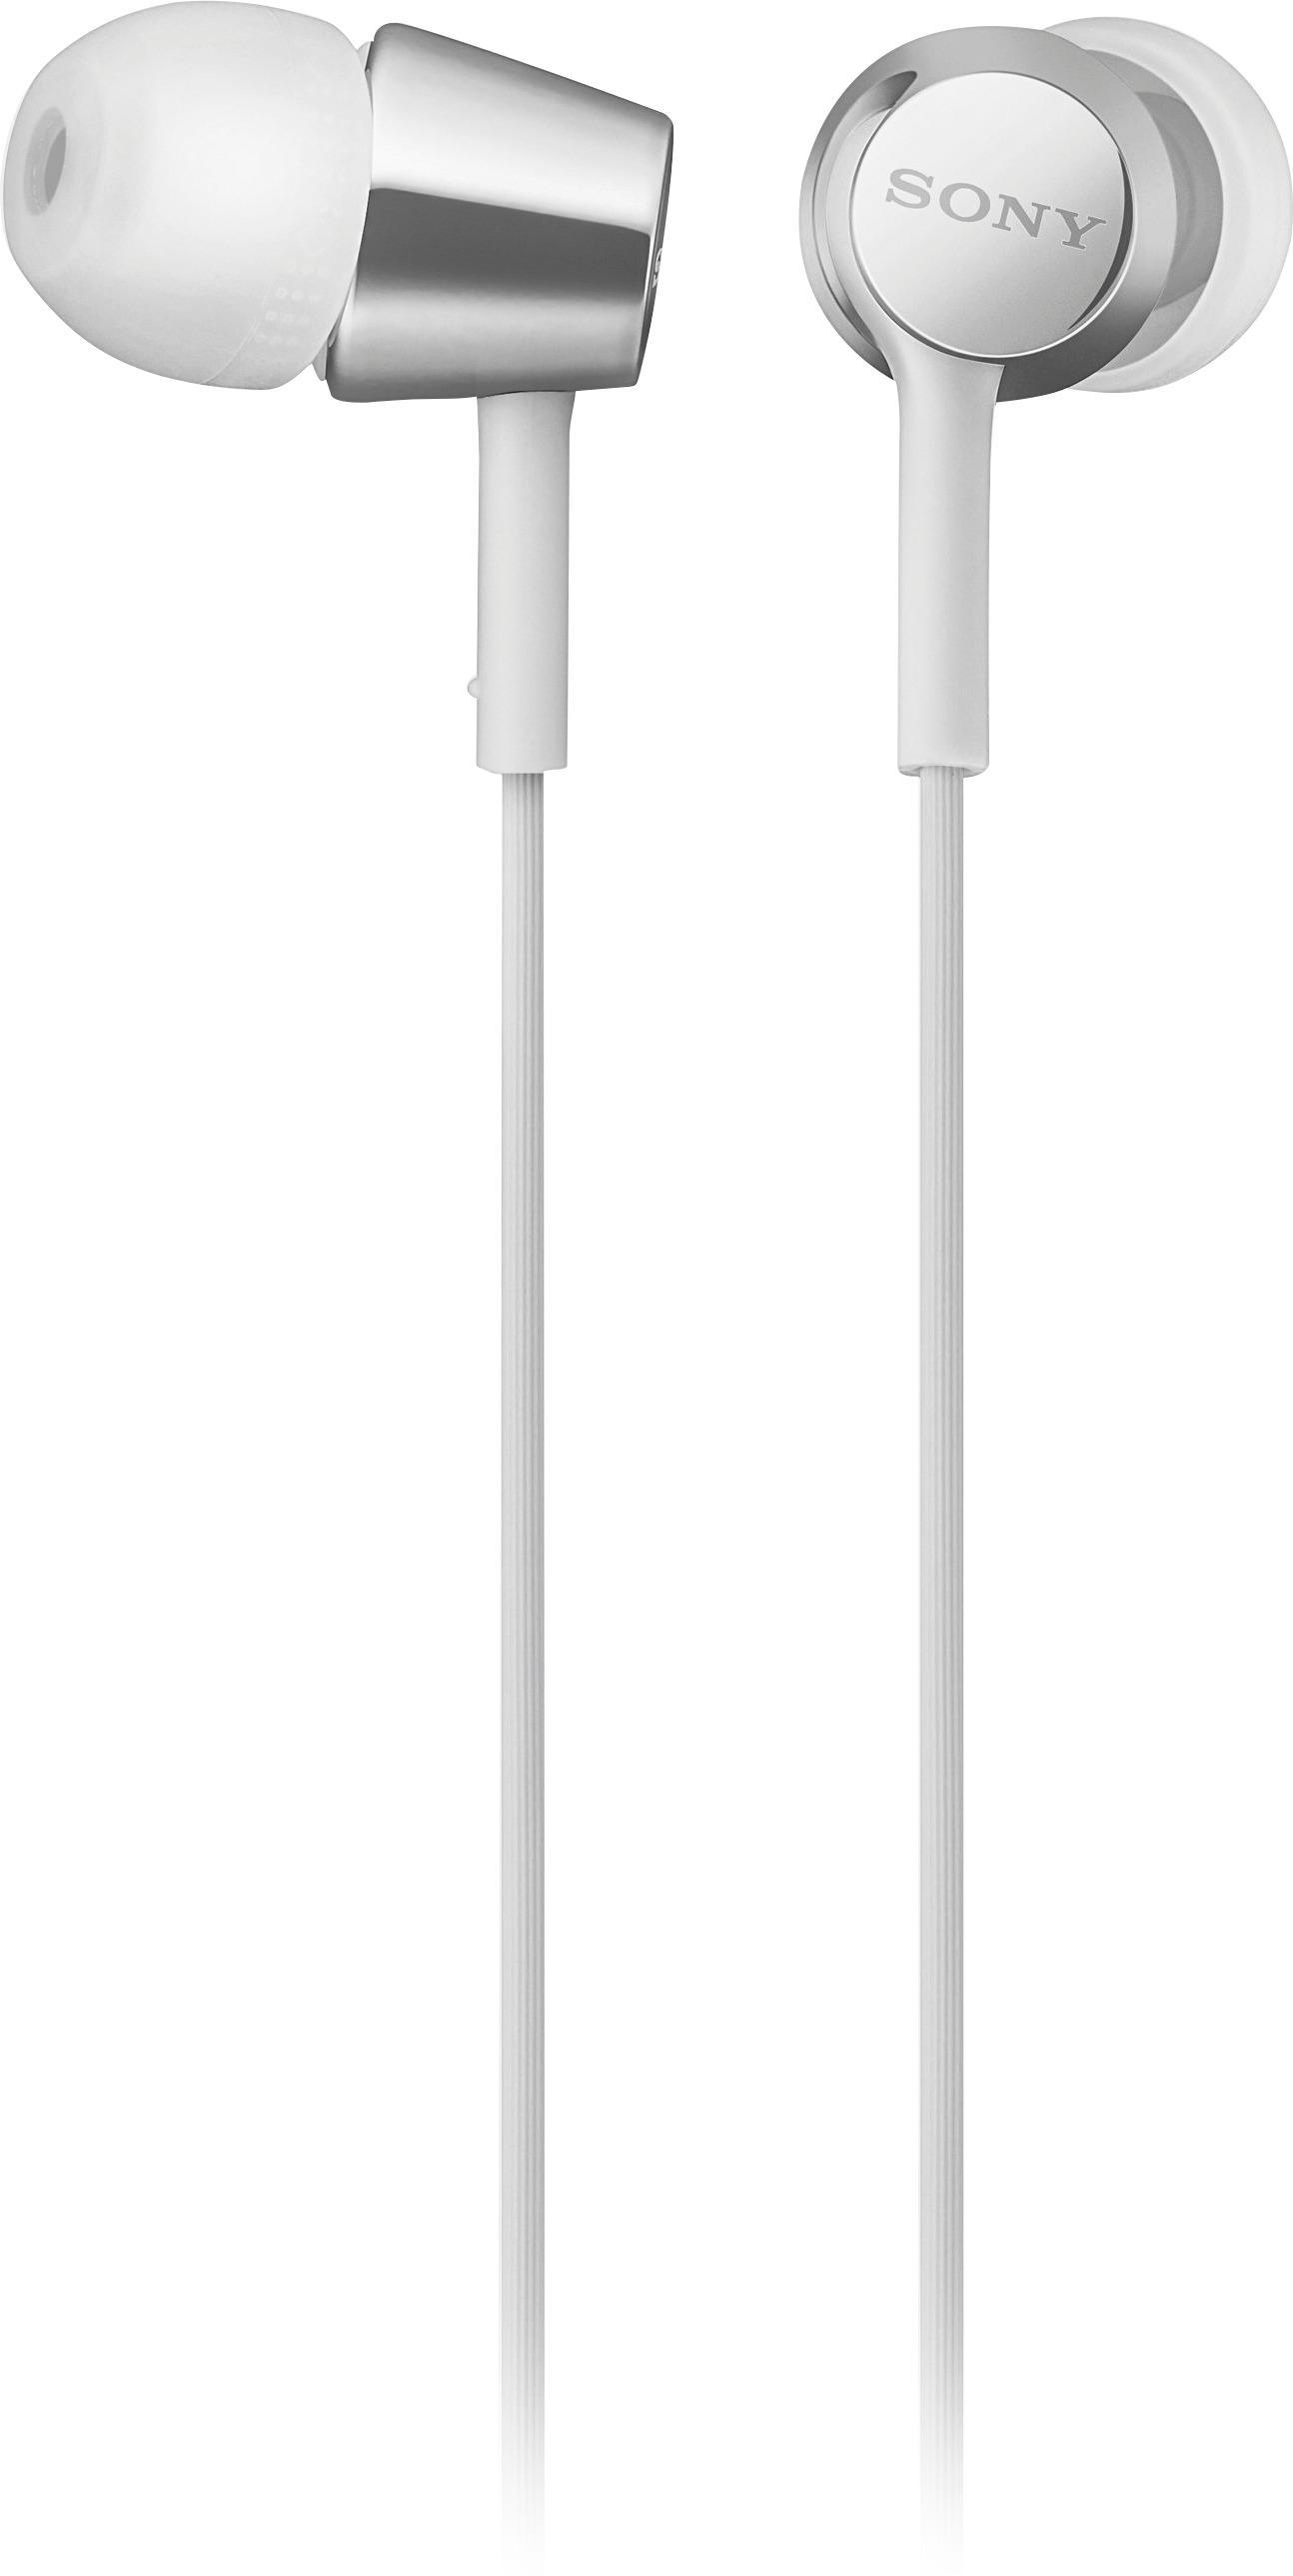 hight resolution of sony ex155ap ex series wired in ear headphones white mdrex155ap w best buy